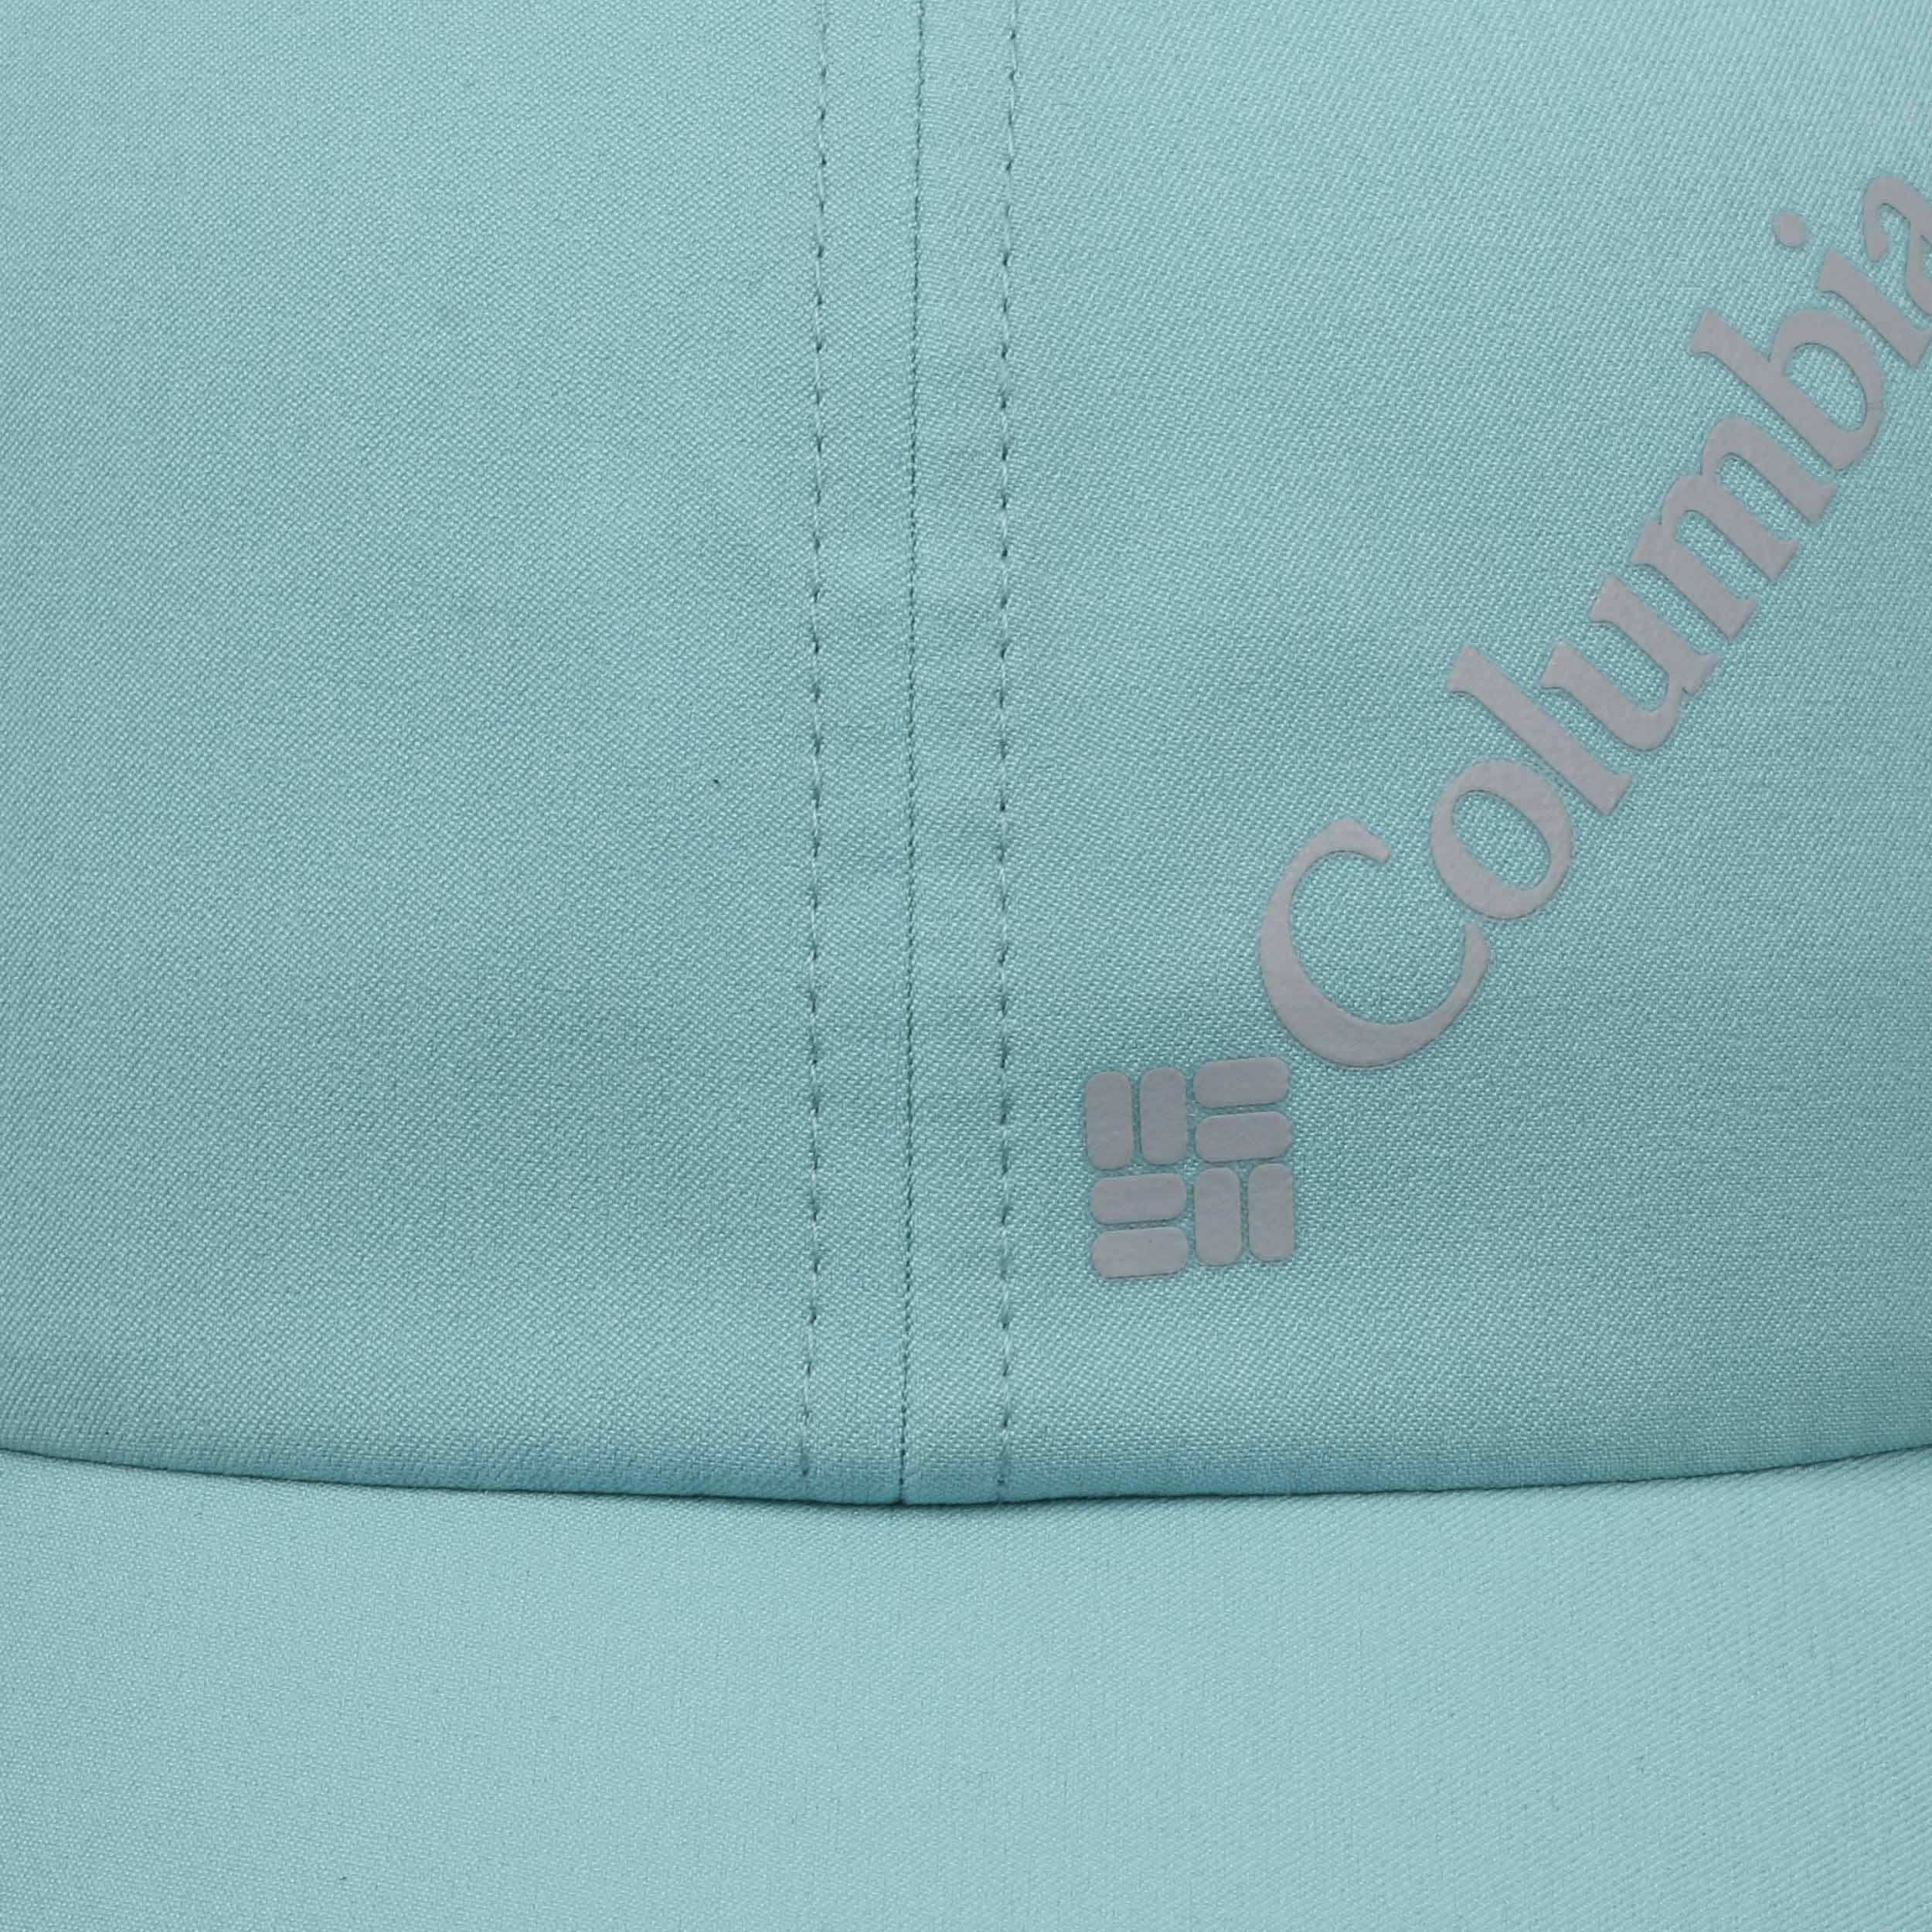 4bfc4d758e ... Silver Ridge Women´s Cap by Columbia - turquoise 4 ...